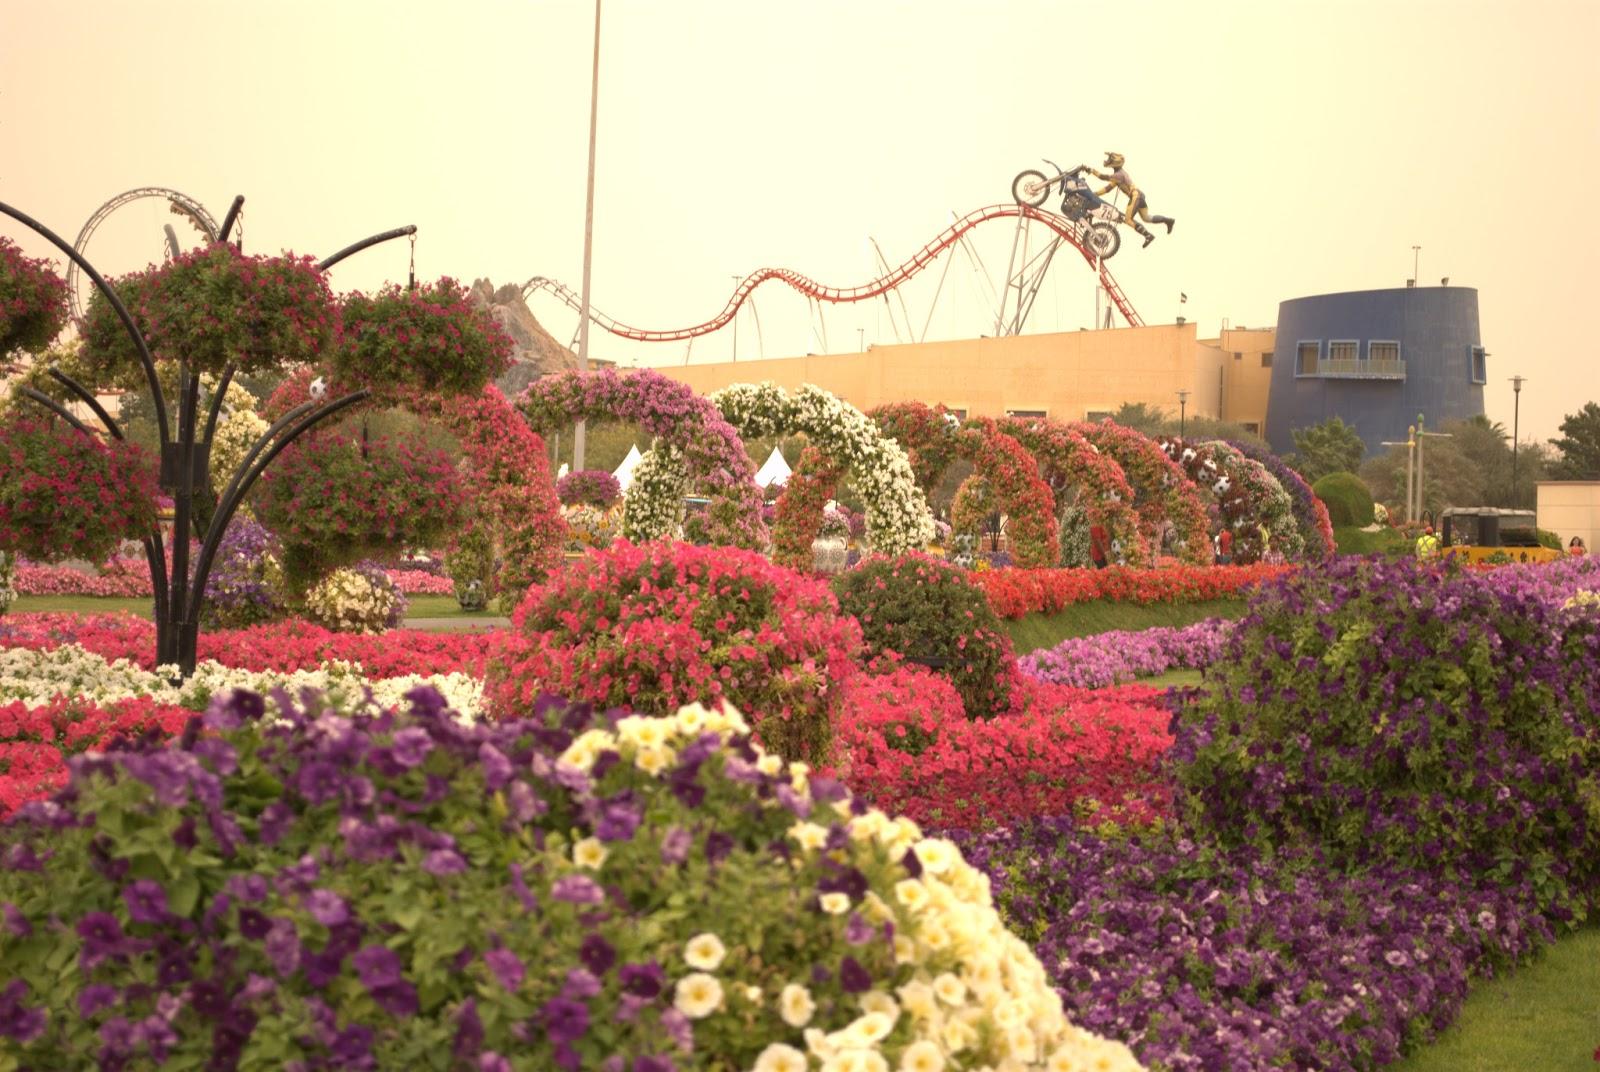 A day in Miracle Garden, Dubai | Vagish Hardooru